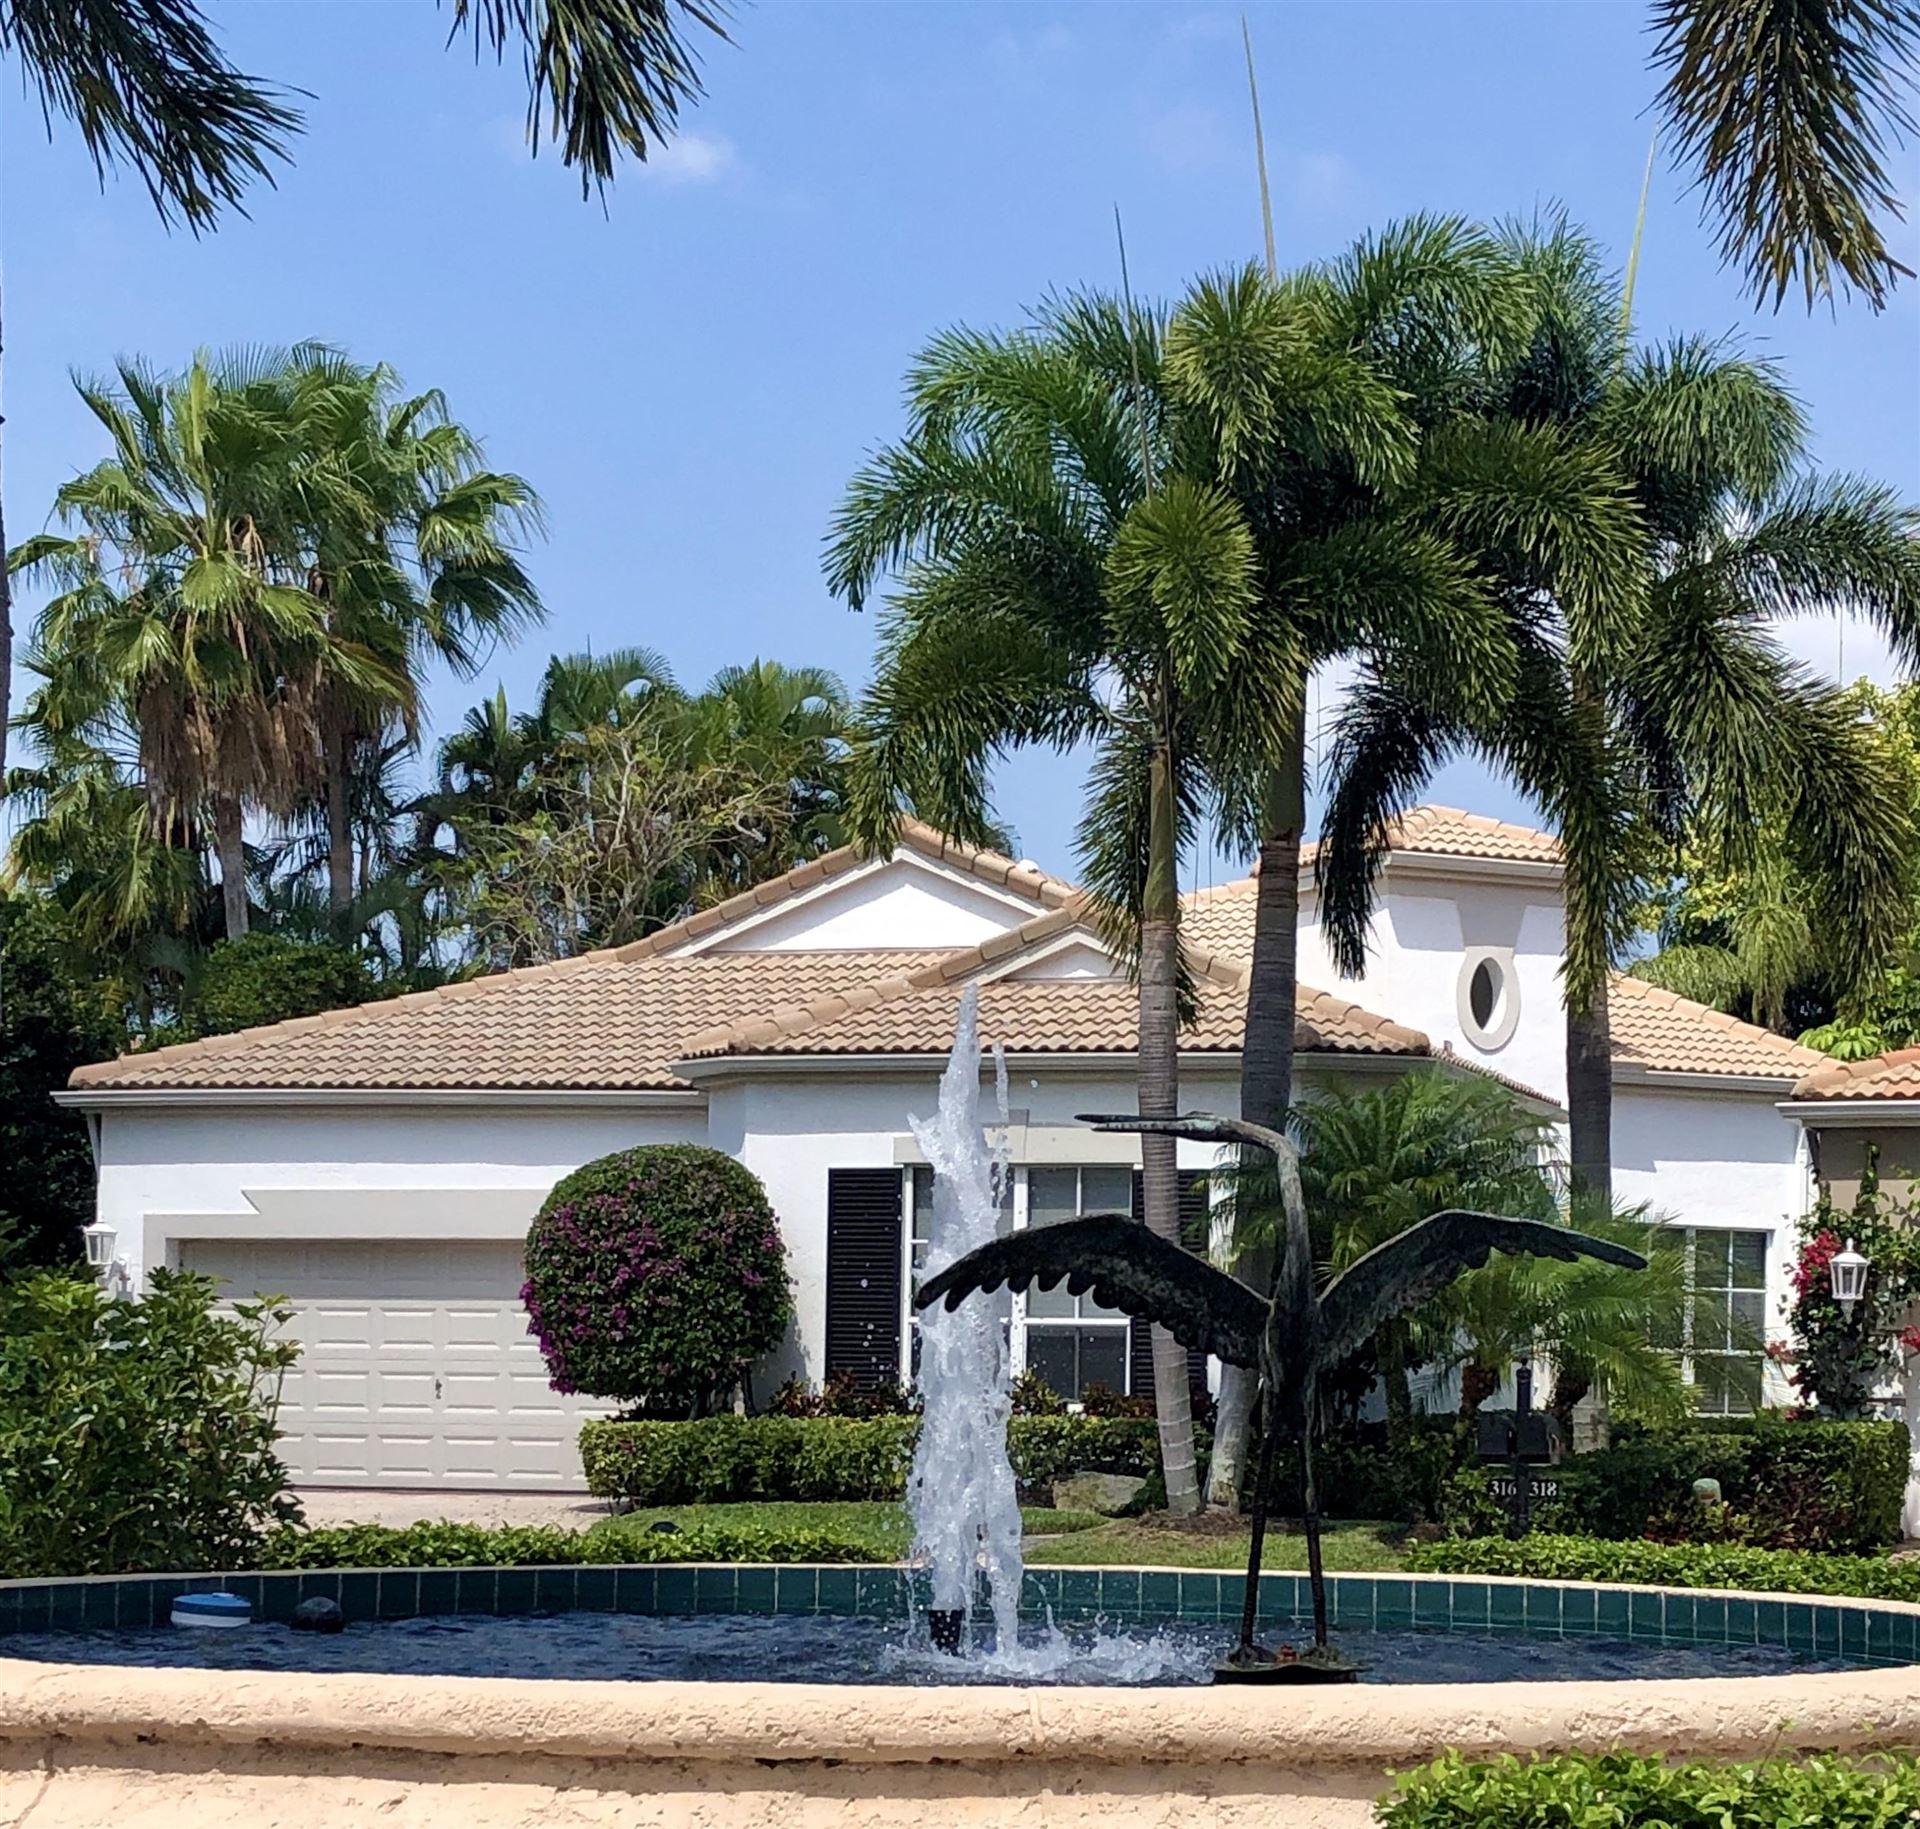 316 Sunset Bay Lane, Palm Beach Gardens, FL 33418 - #: RX-10625609